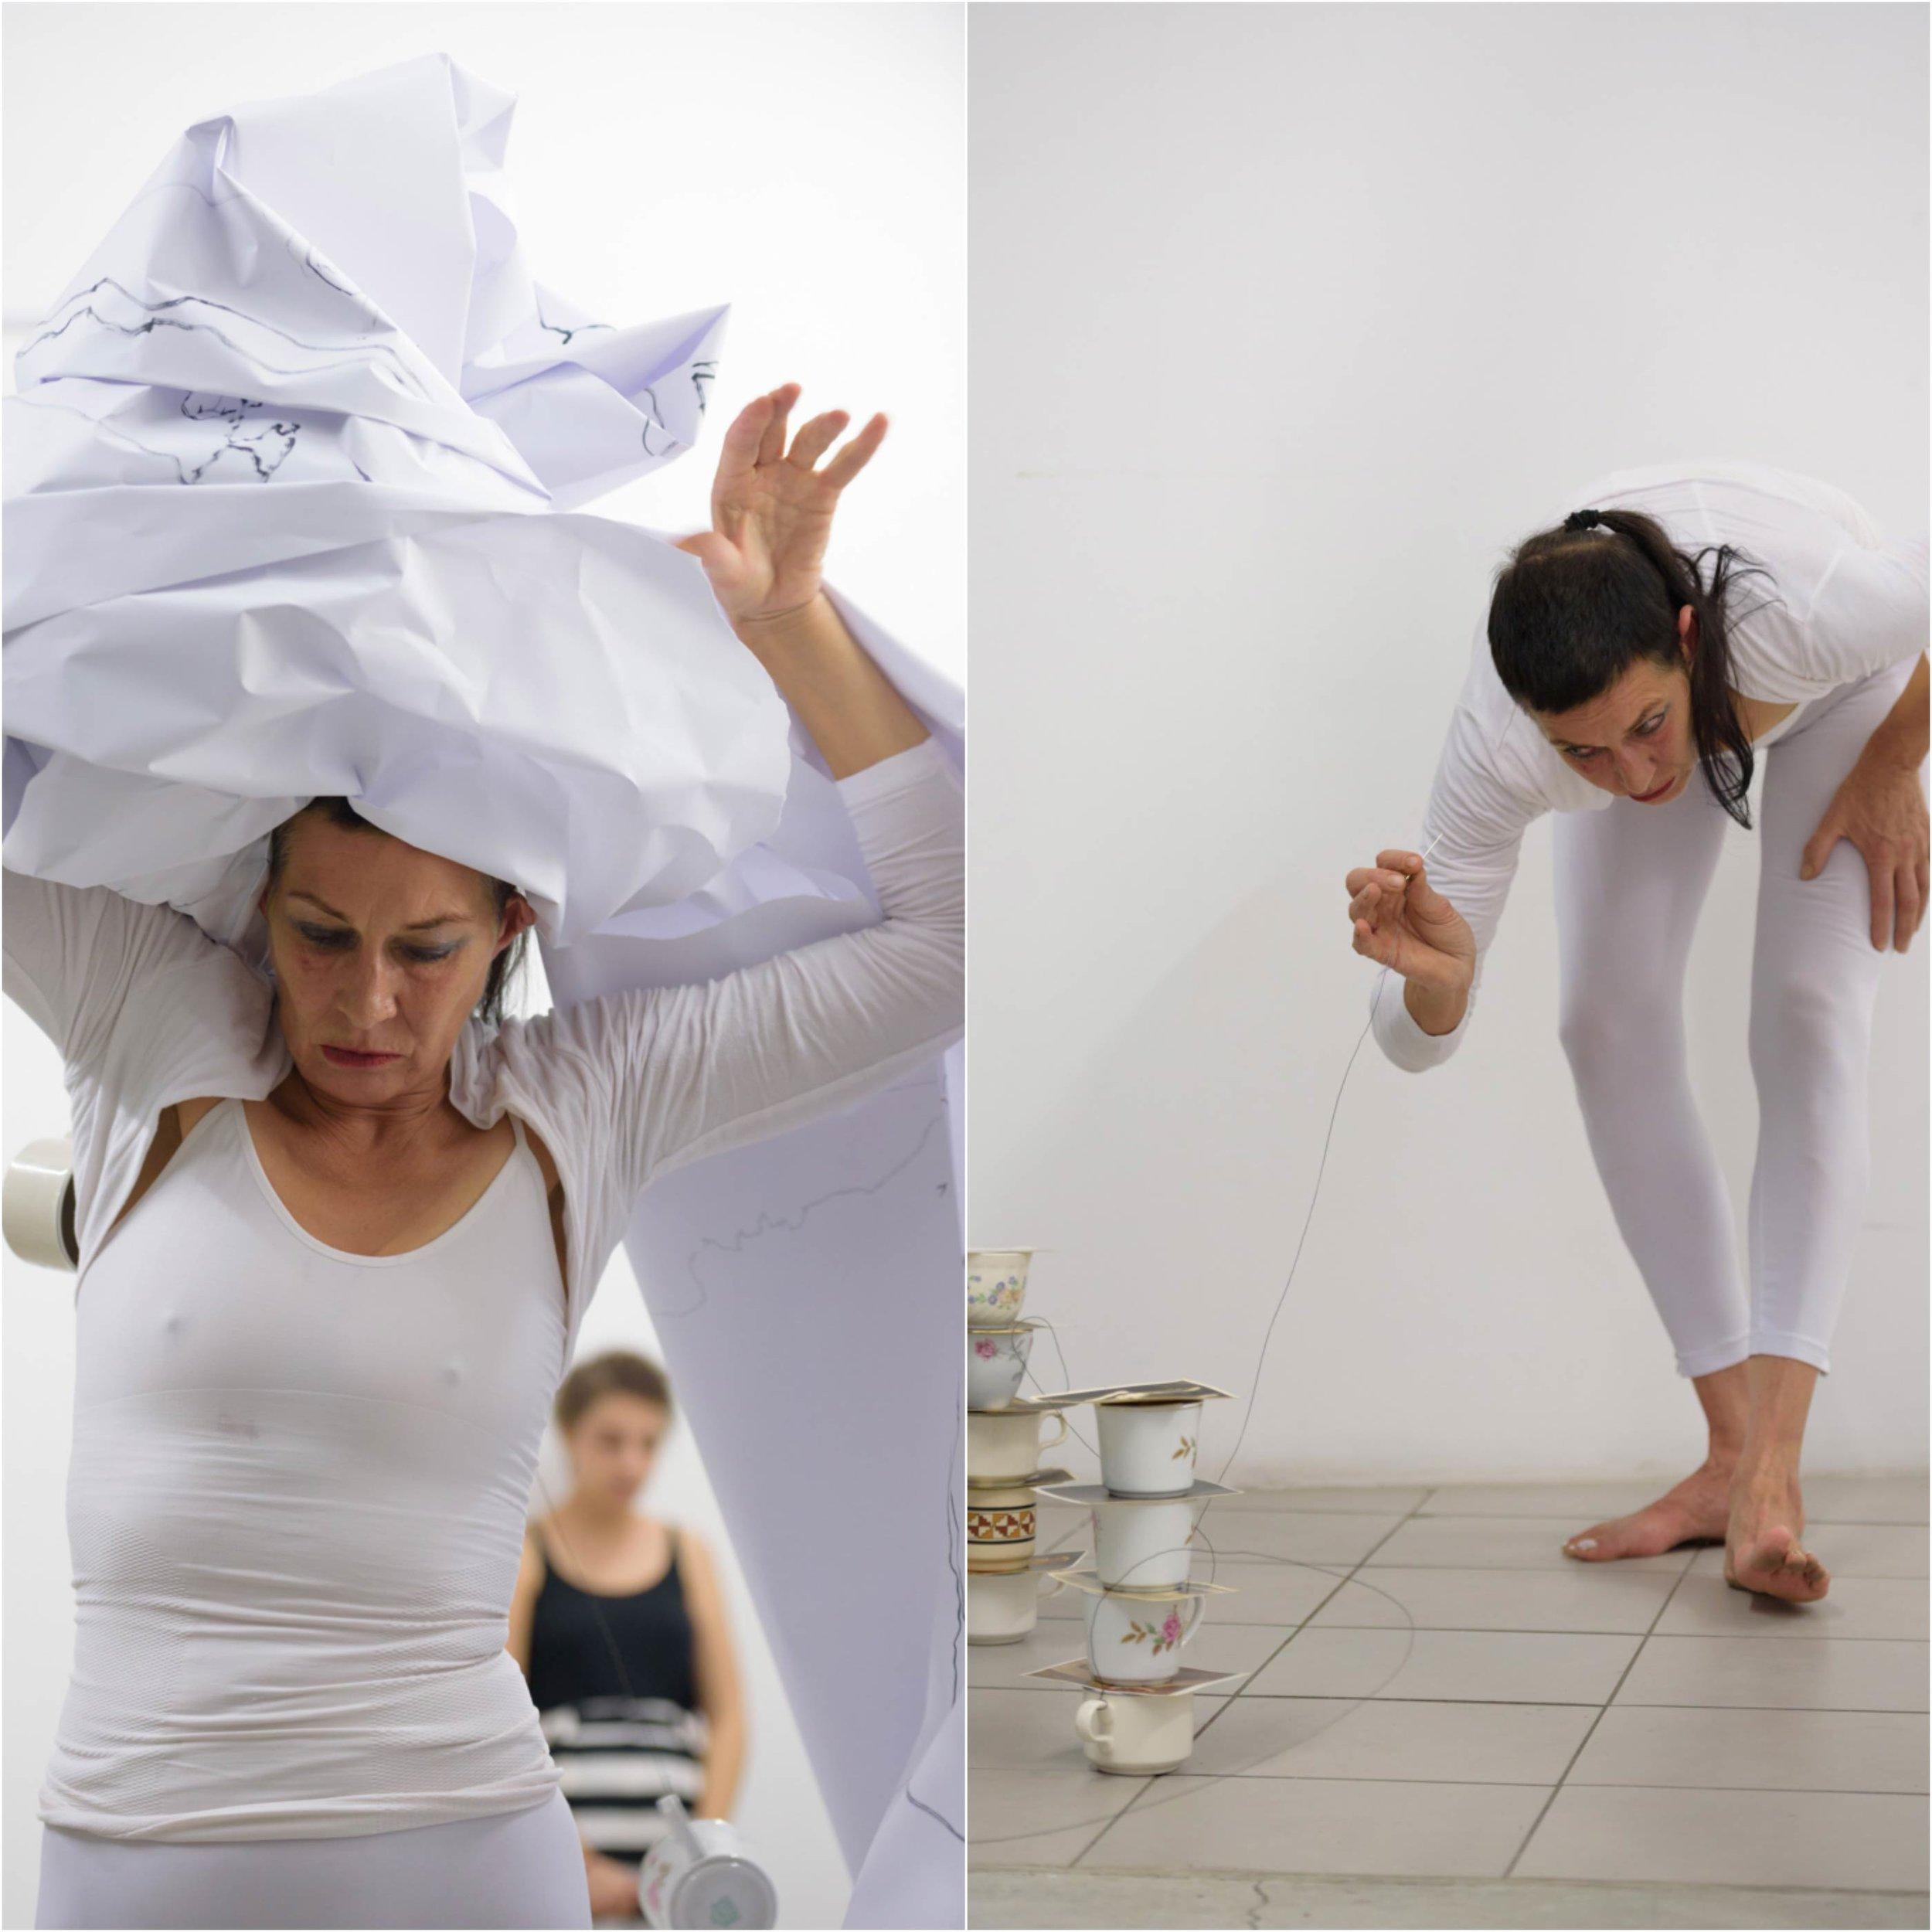 Live Performance, ' Language of Cup' , PLUS-MOTION, Performance Art Event, Cyprus 2016, photographed by Pavlos Vrionides